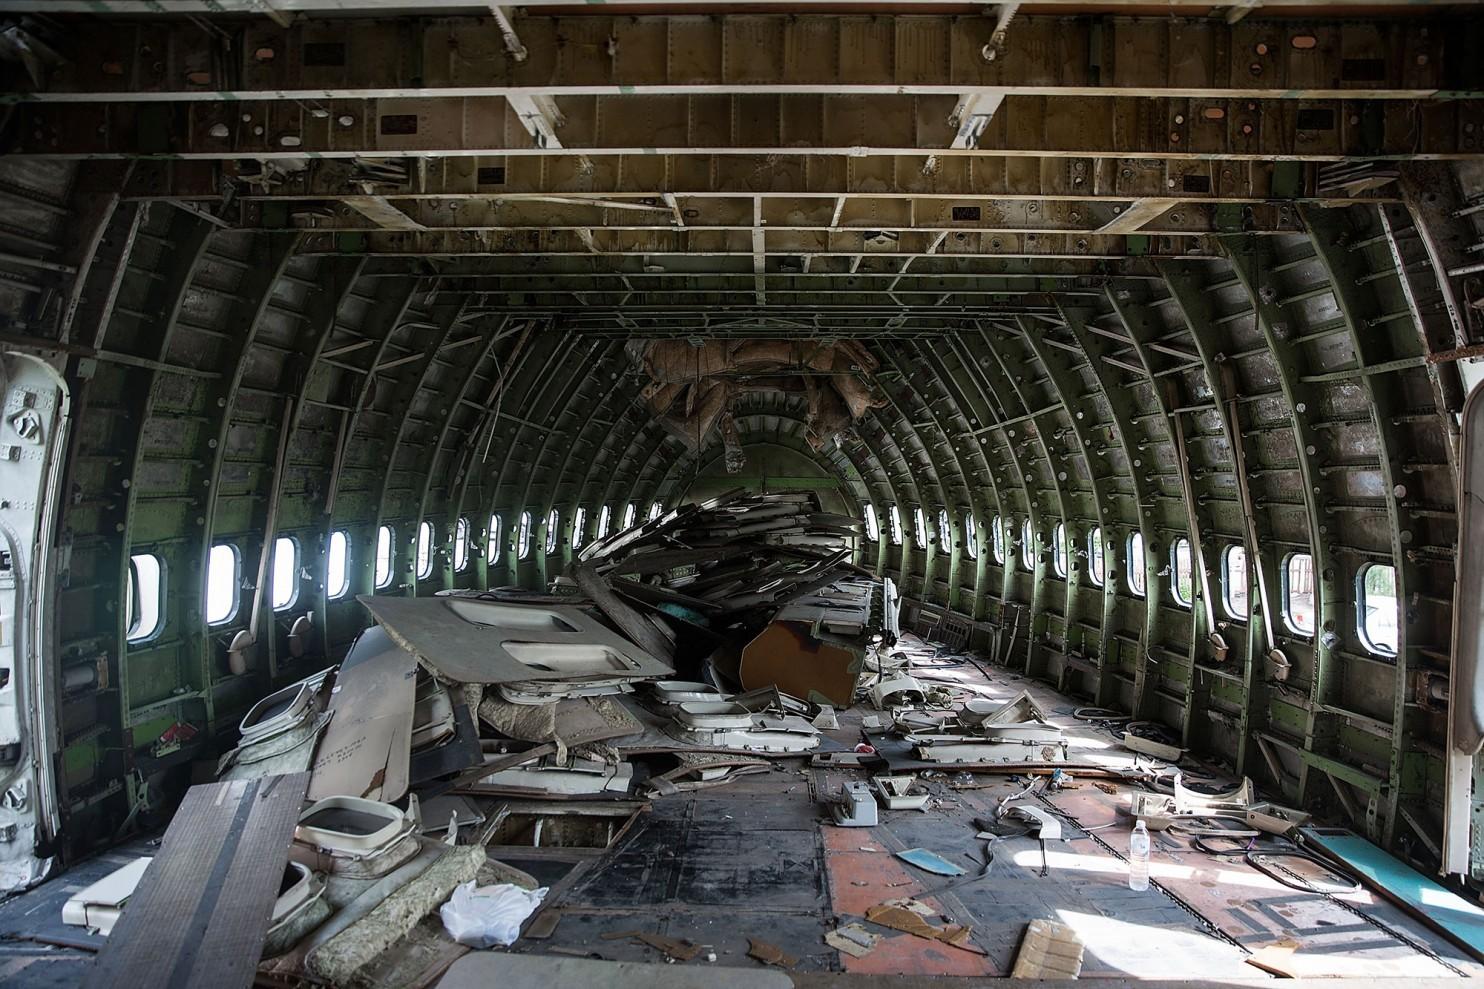 bangkok-airplanes-home-07